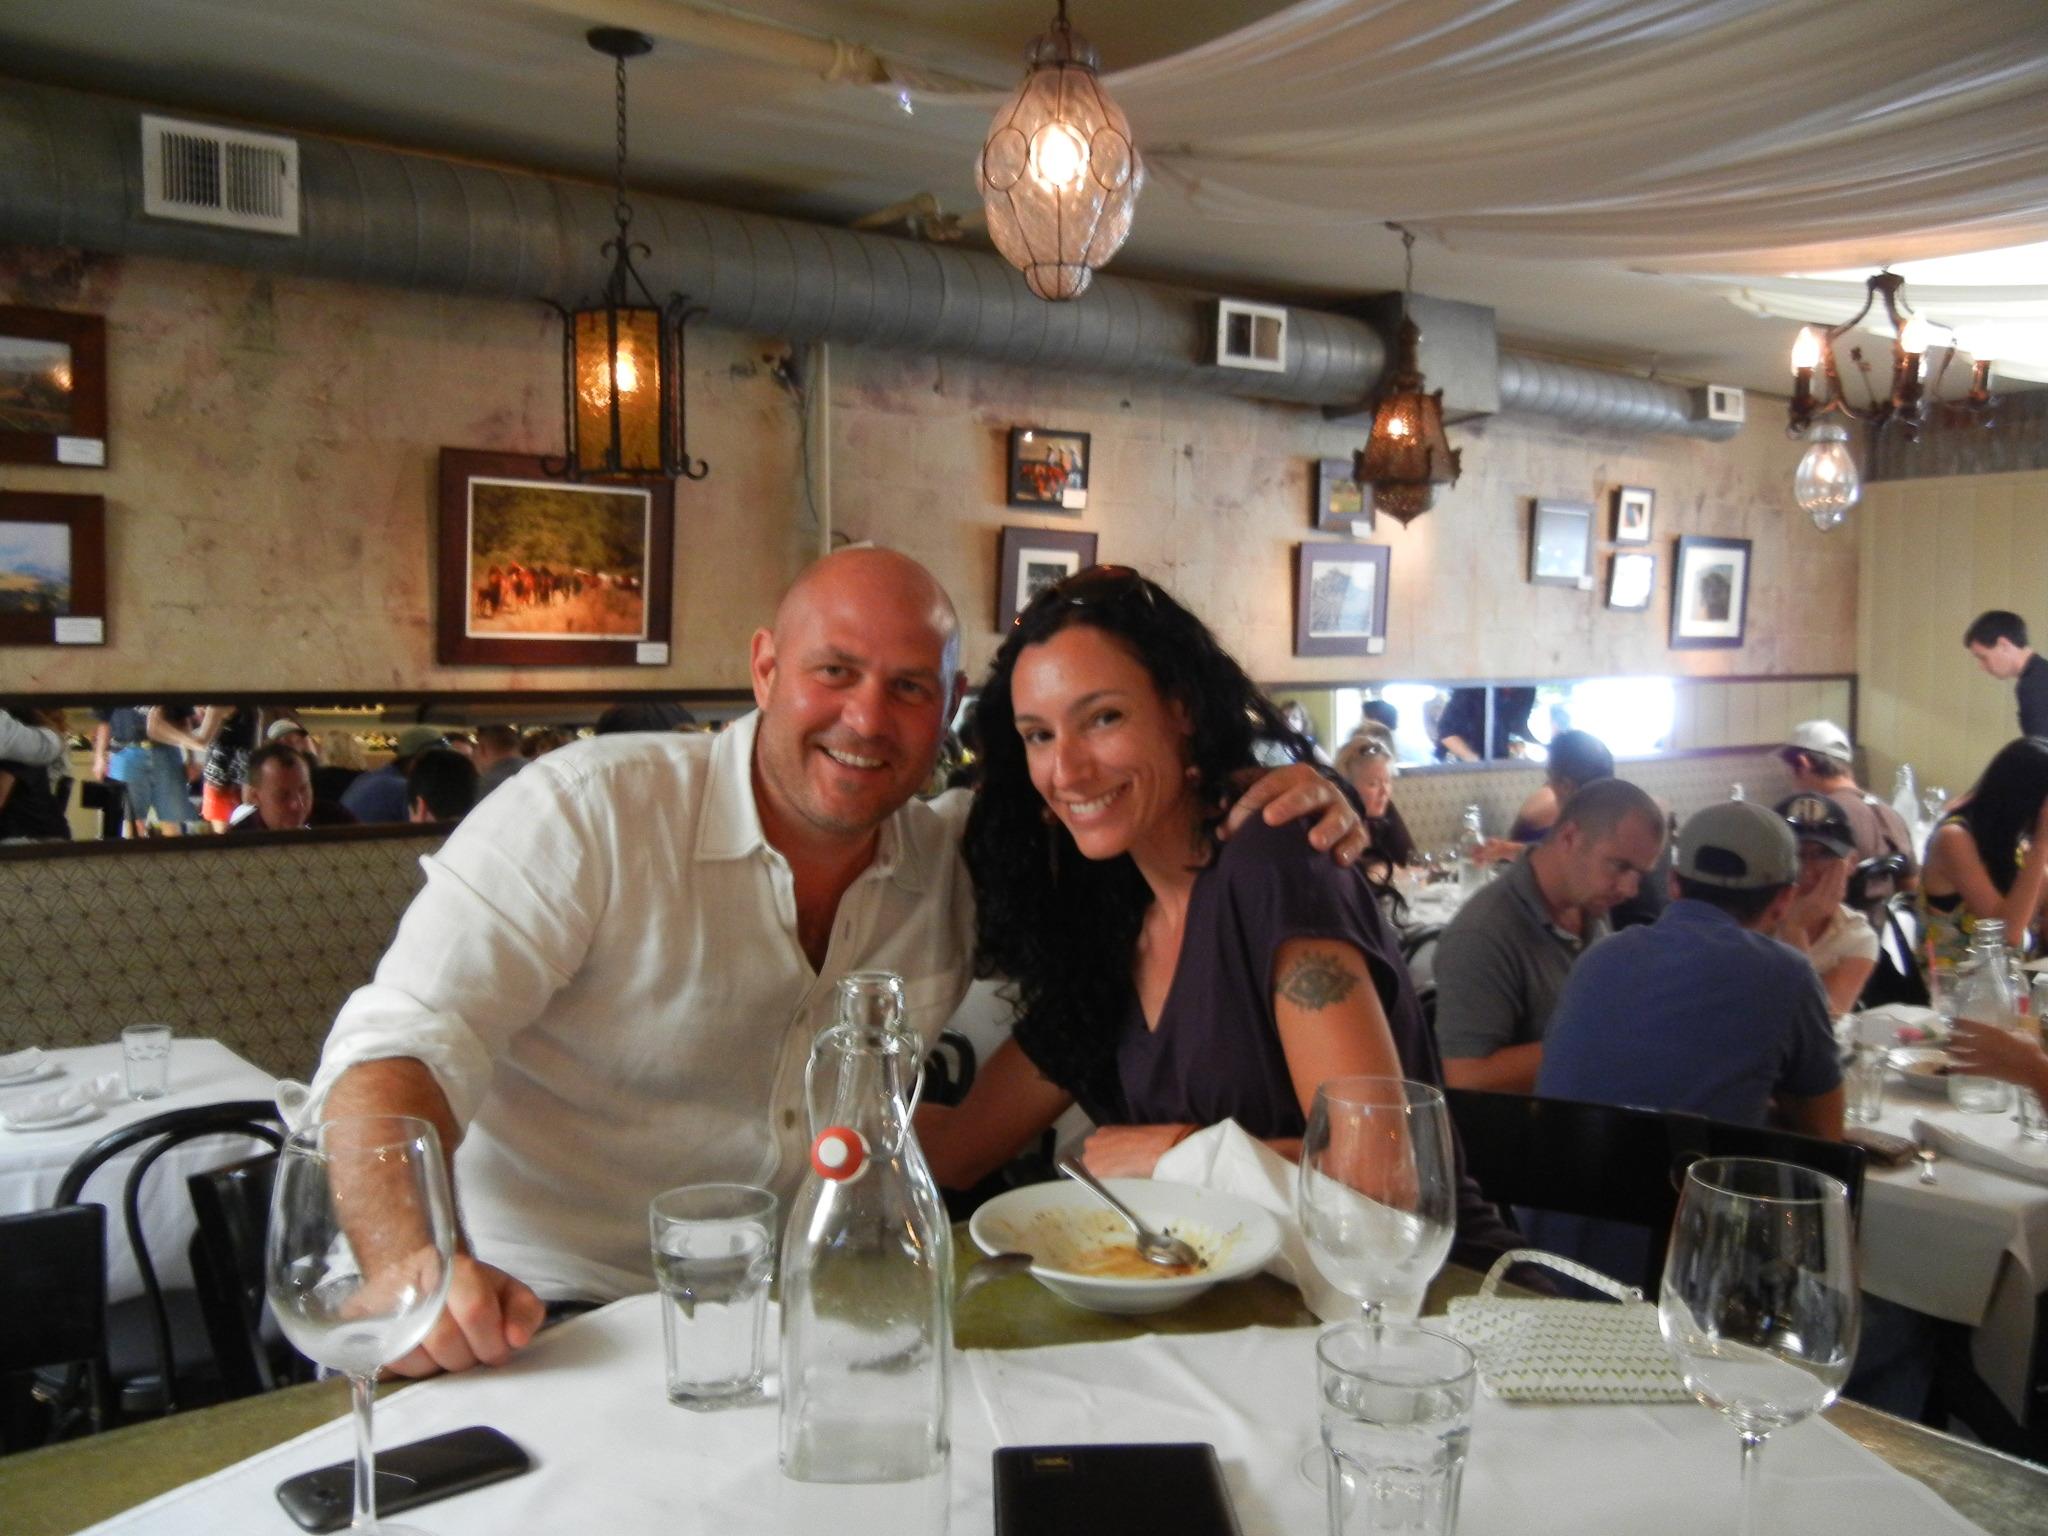 Giampiero Ambrosi and Denise